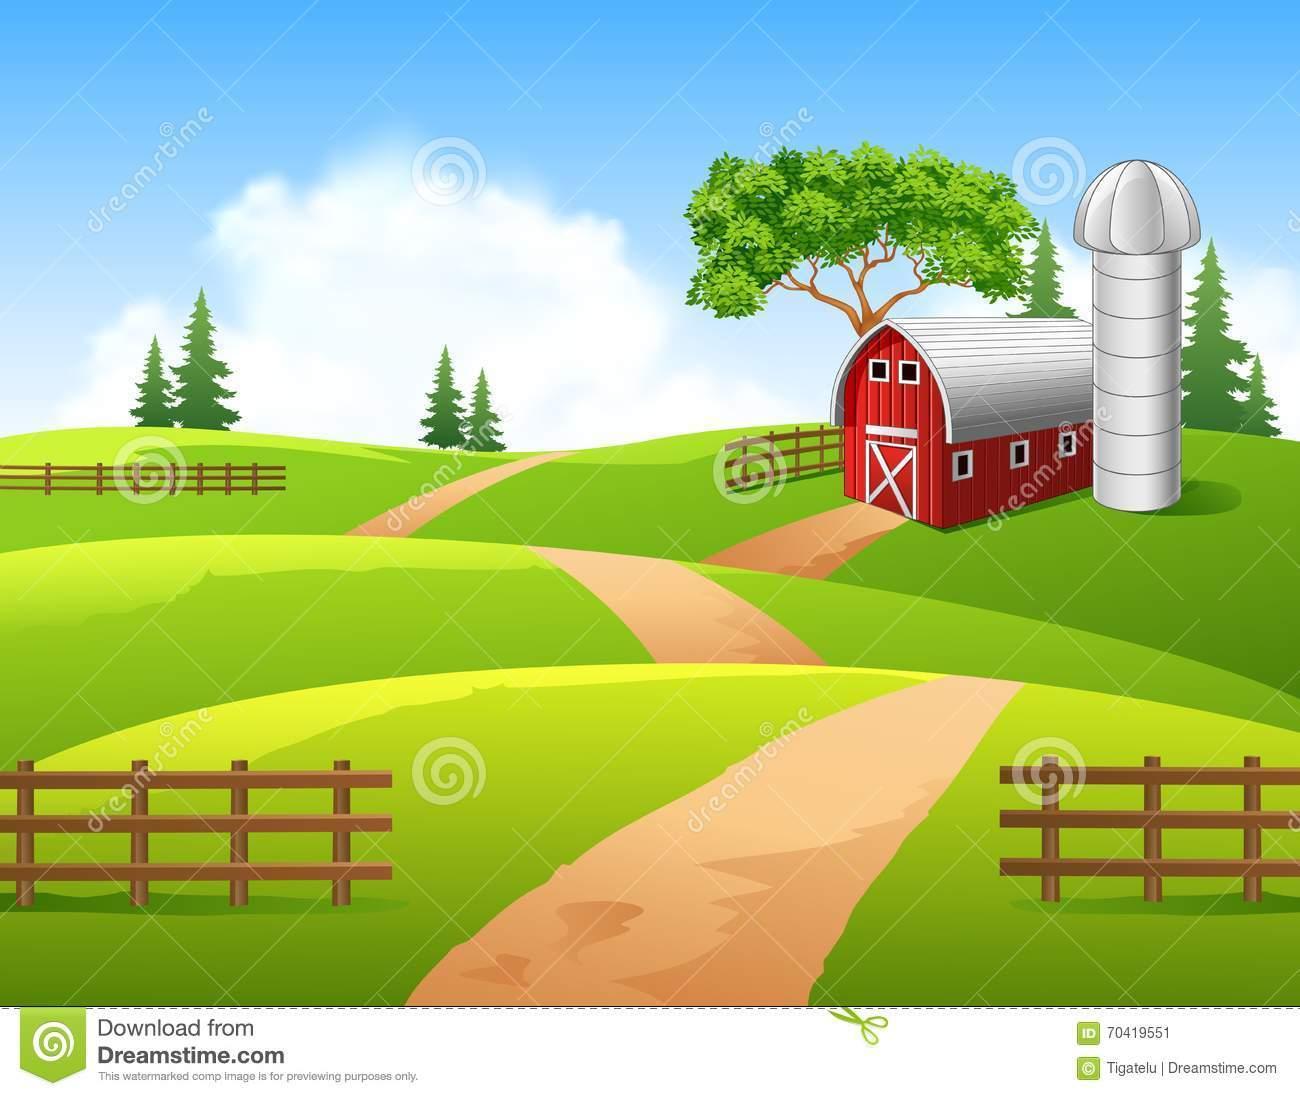 Farm clipart background 7 » Clipart Portal.